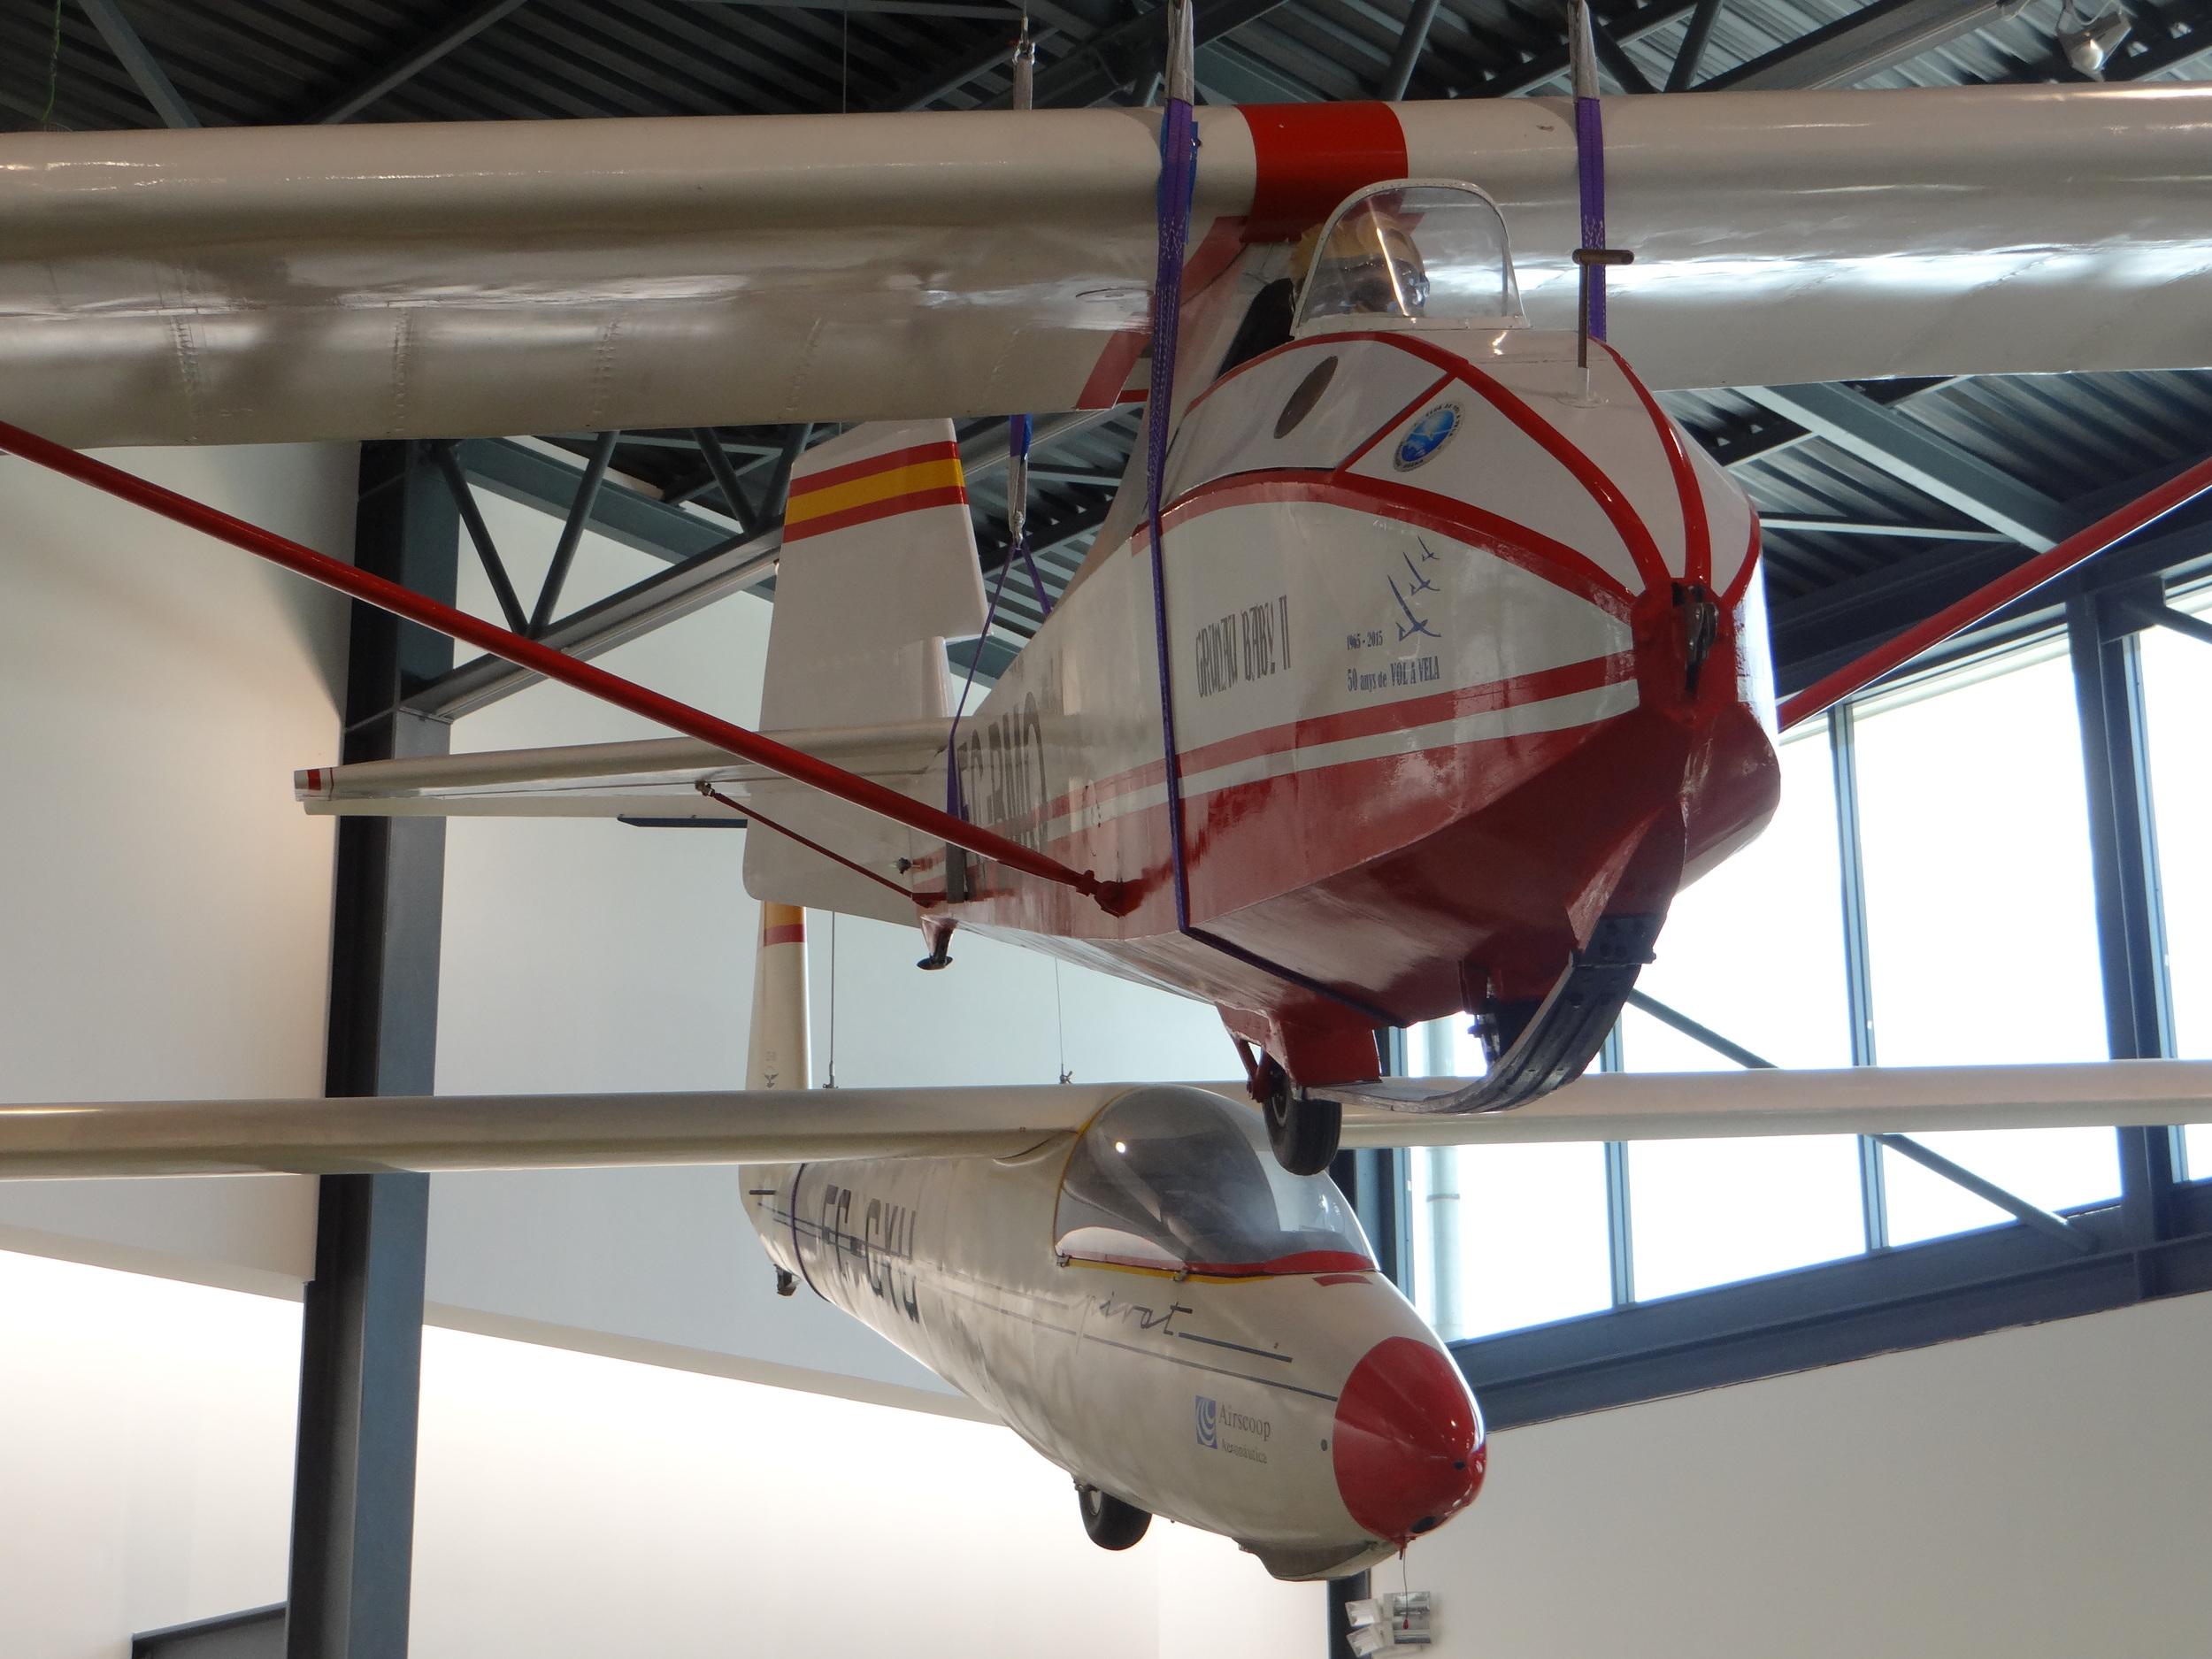 A sailplane close-up